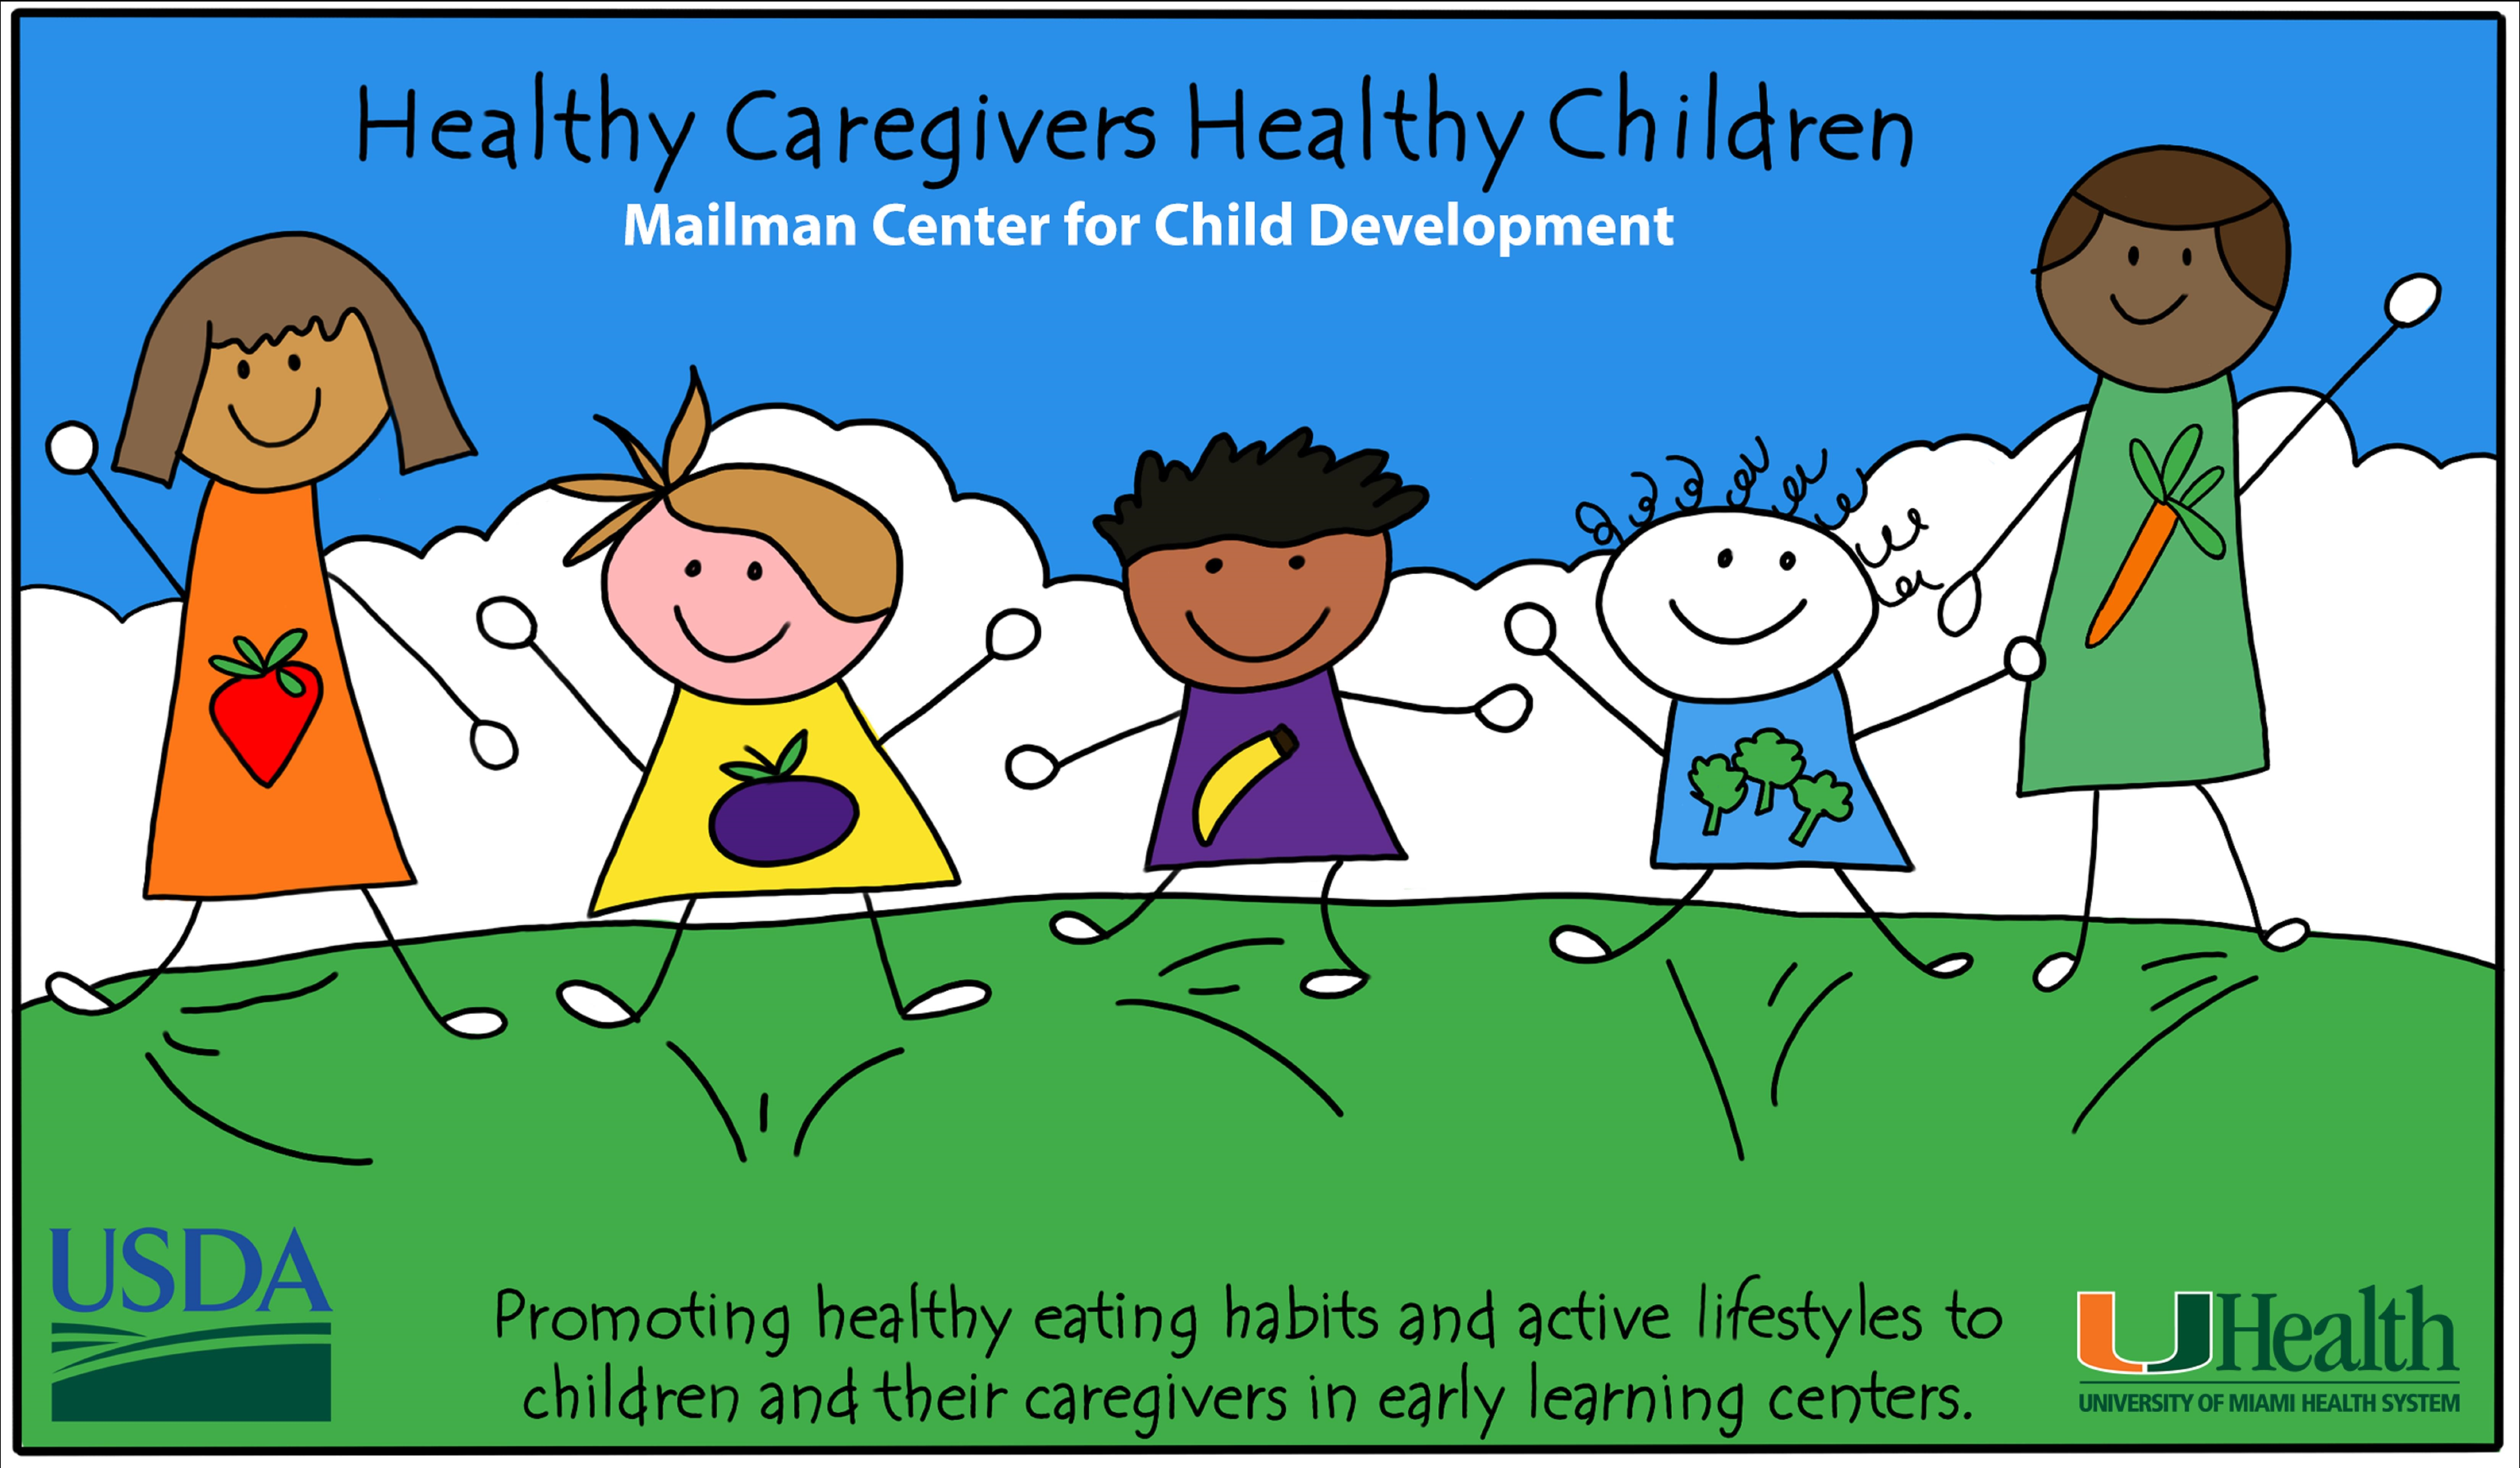 Healthy Caregivers Healthy Children logo